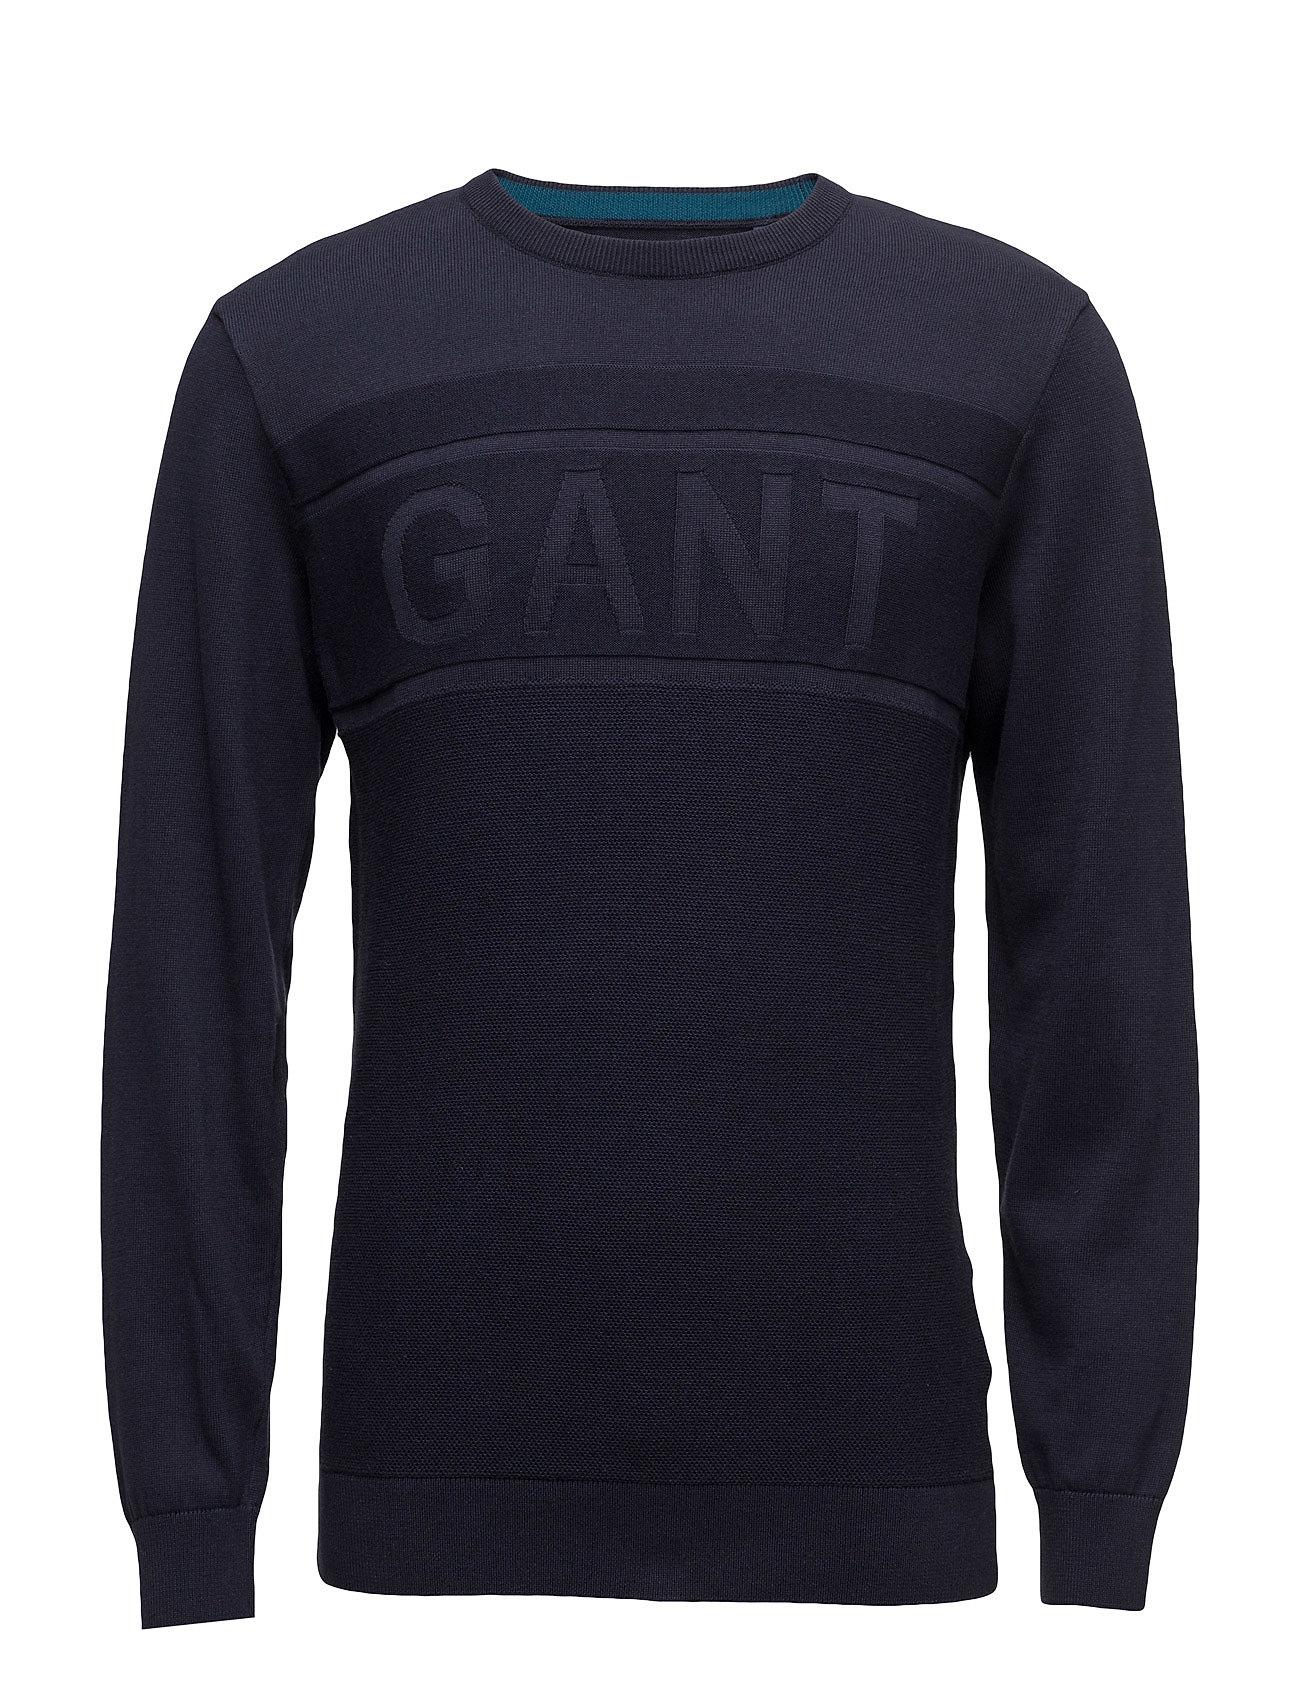 GANT O1. GANT LOGO TEXTURE CREW